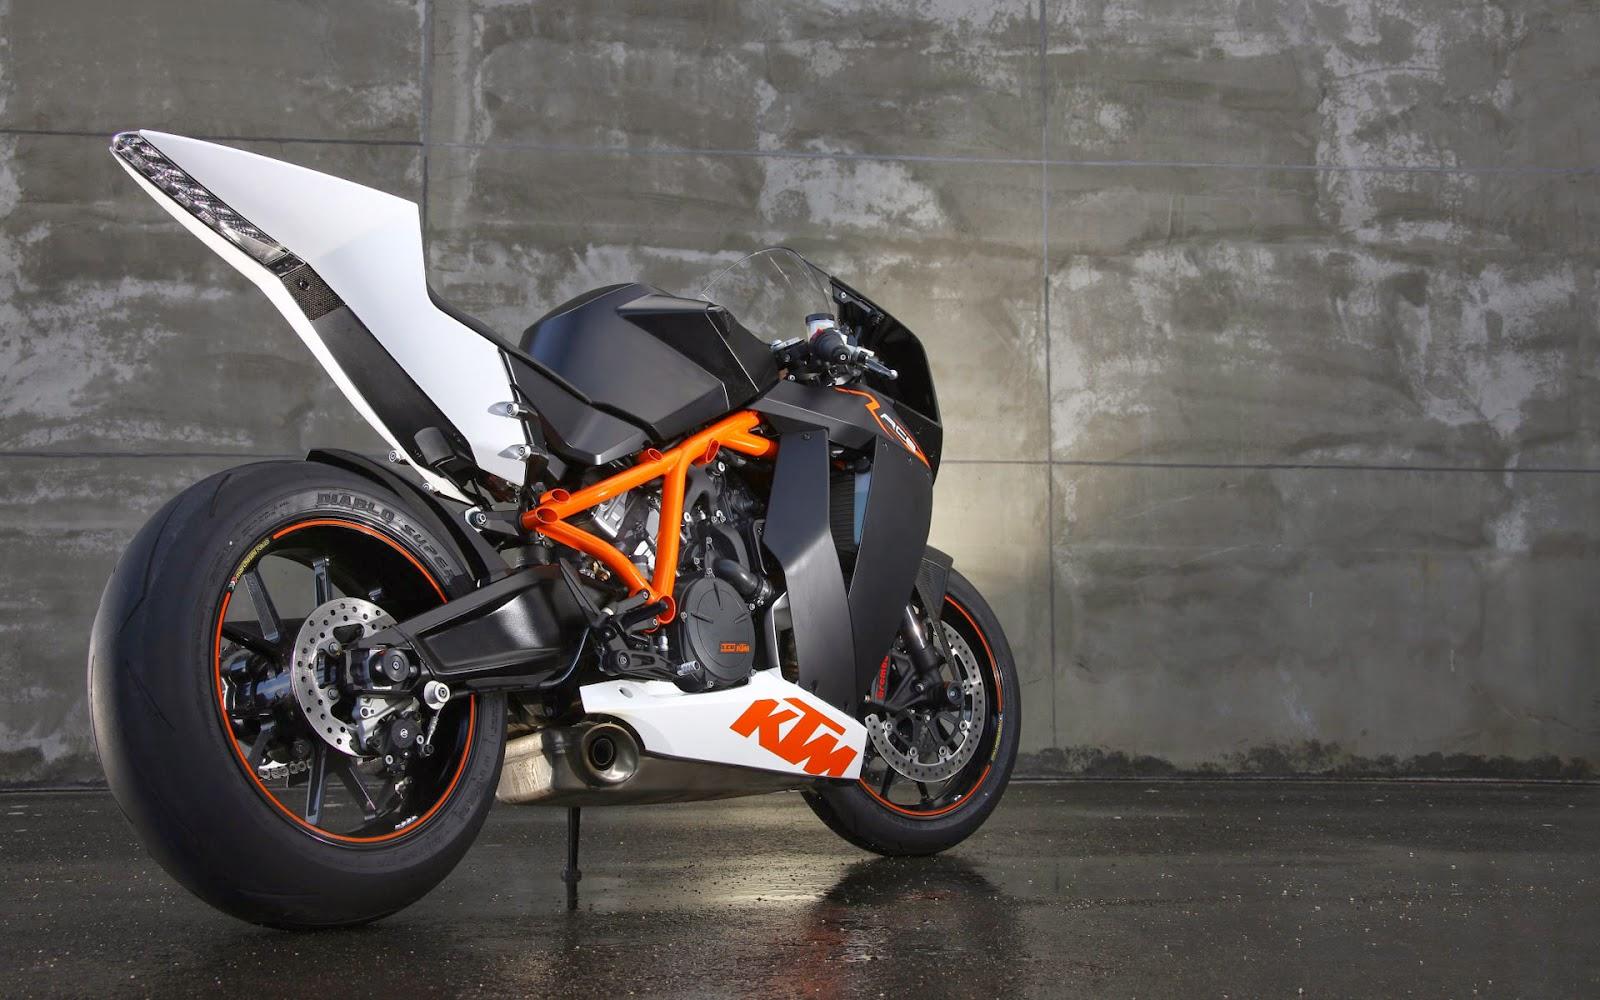 KTM 1190 RC8 R Bikes Price